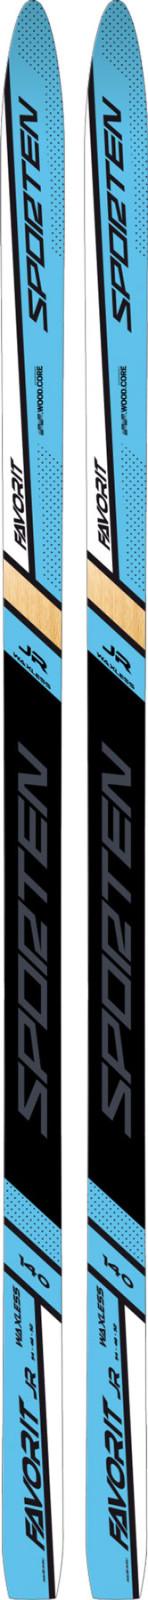 juniorskéběžecké lyže Sporten Favorit 54Wax JR